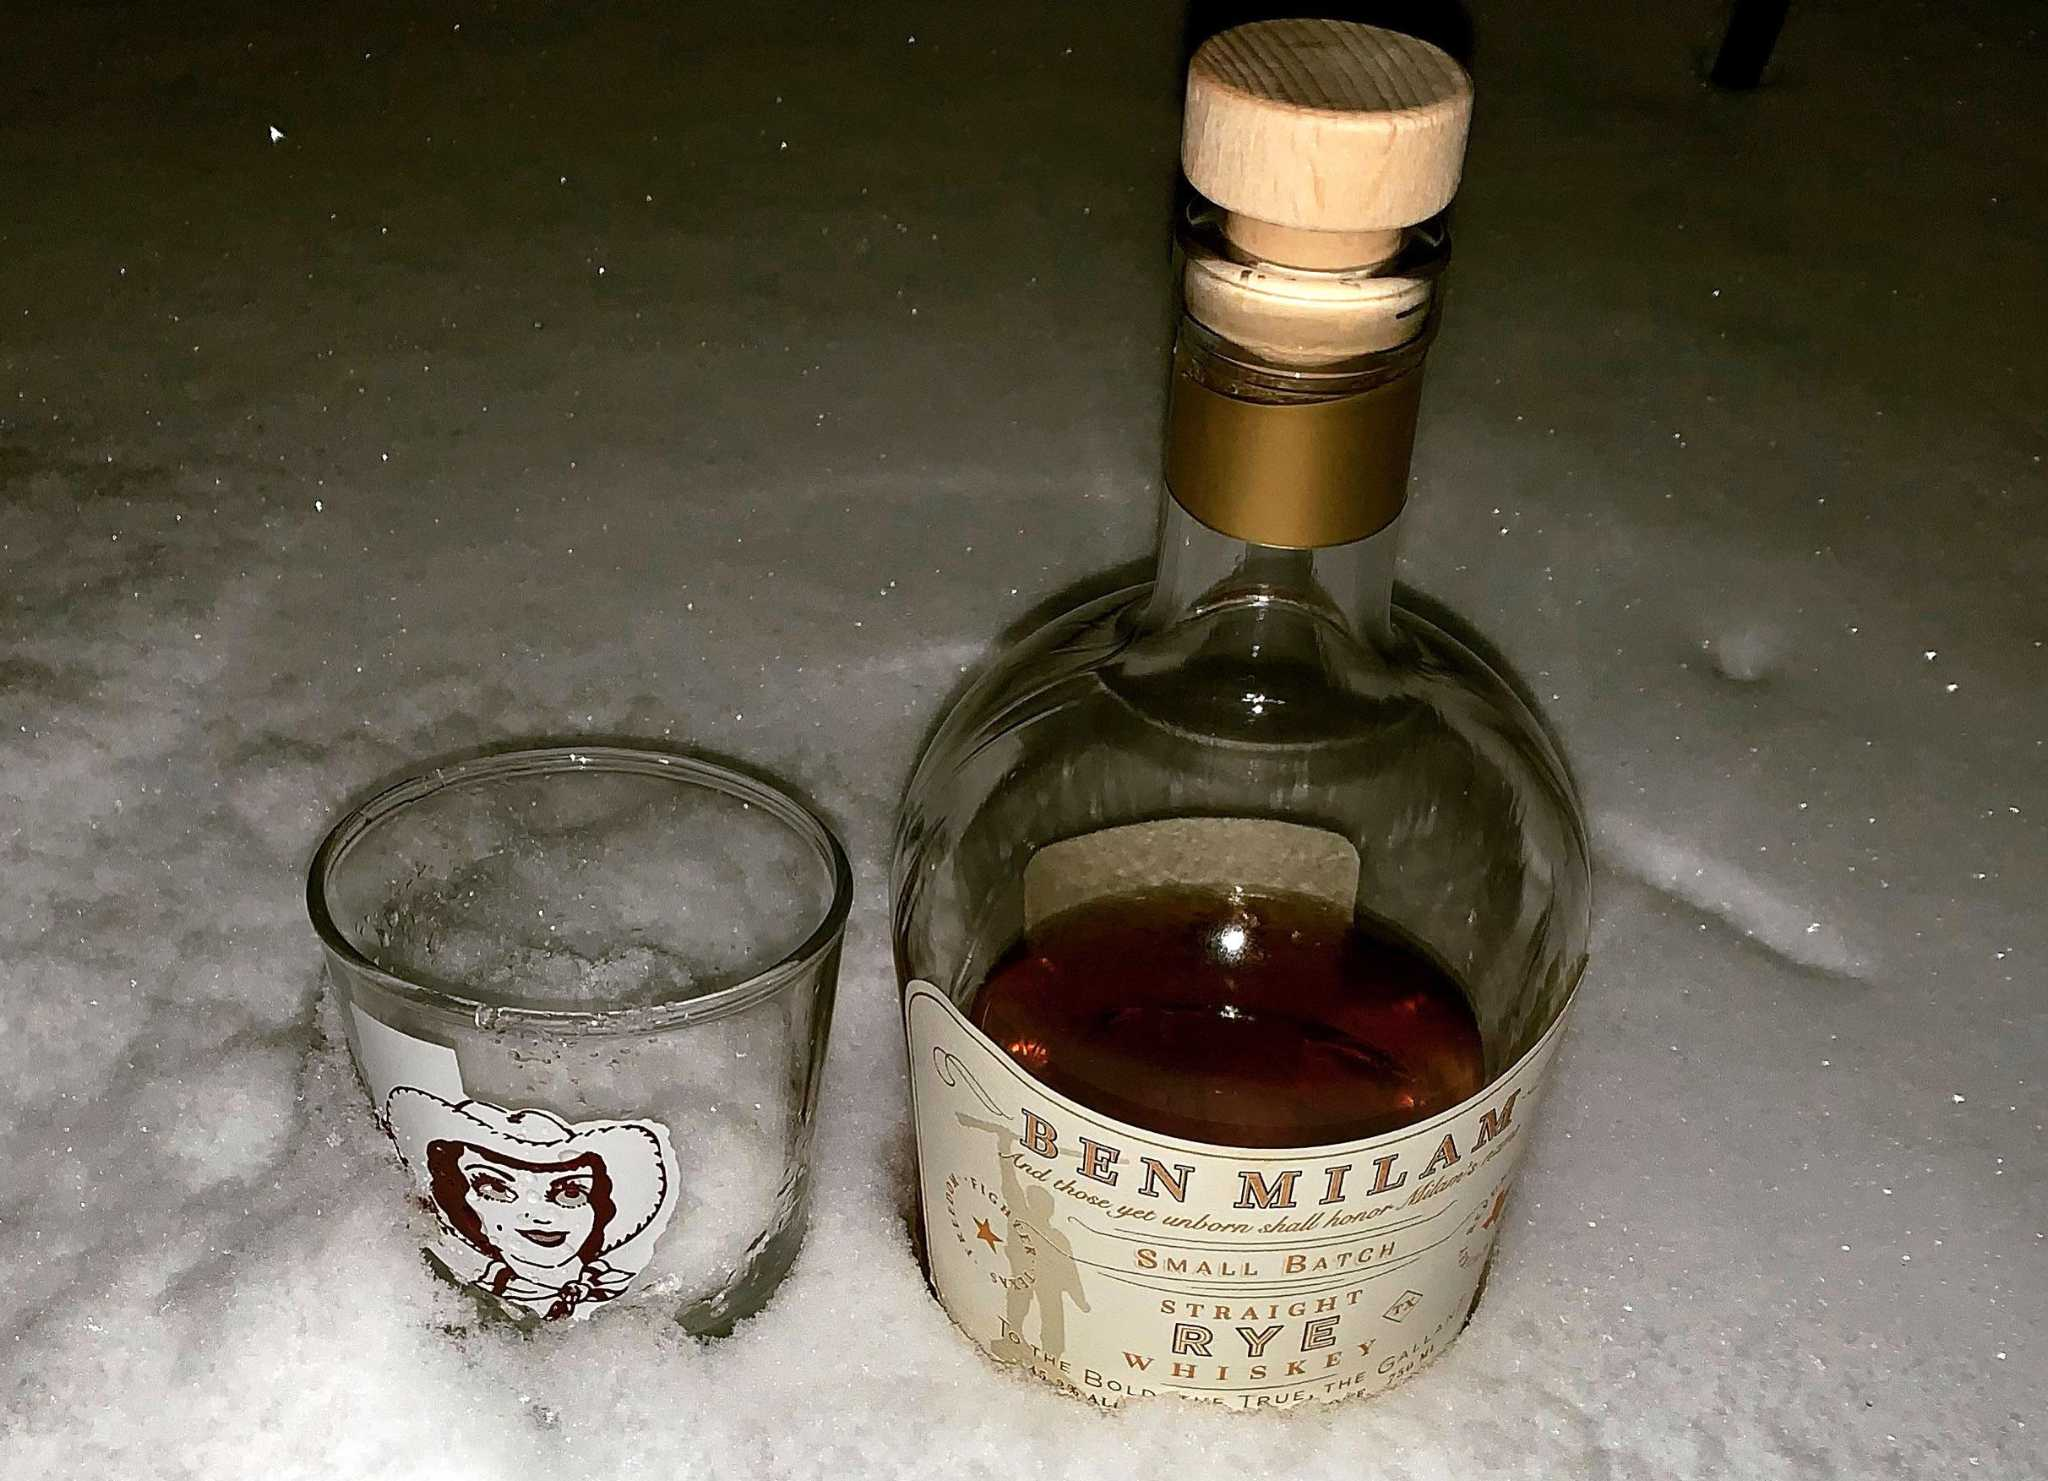 'instead of highballs, we're having snowballs': S.A. kept drinking